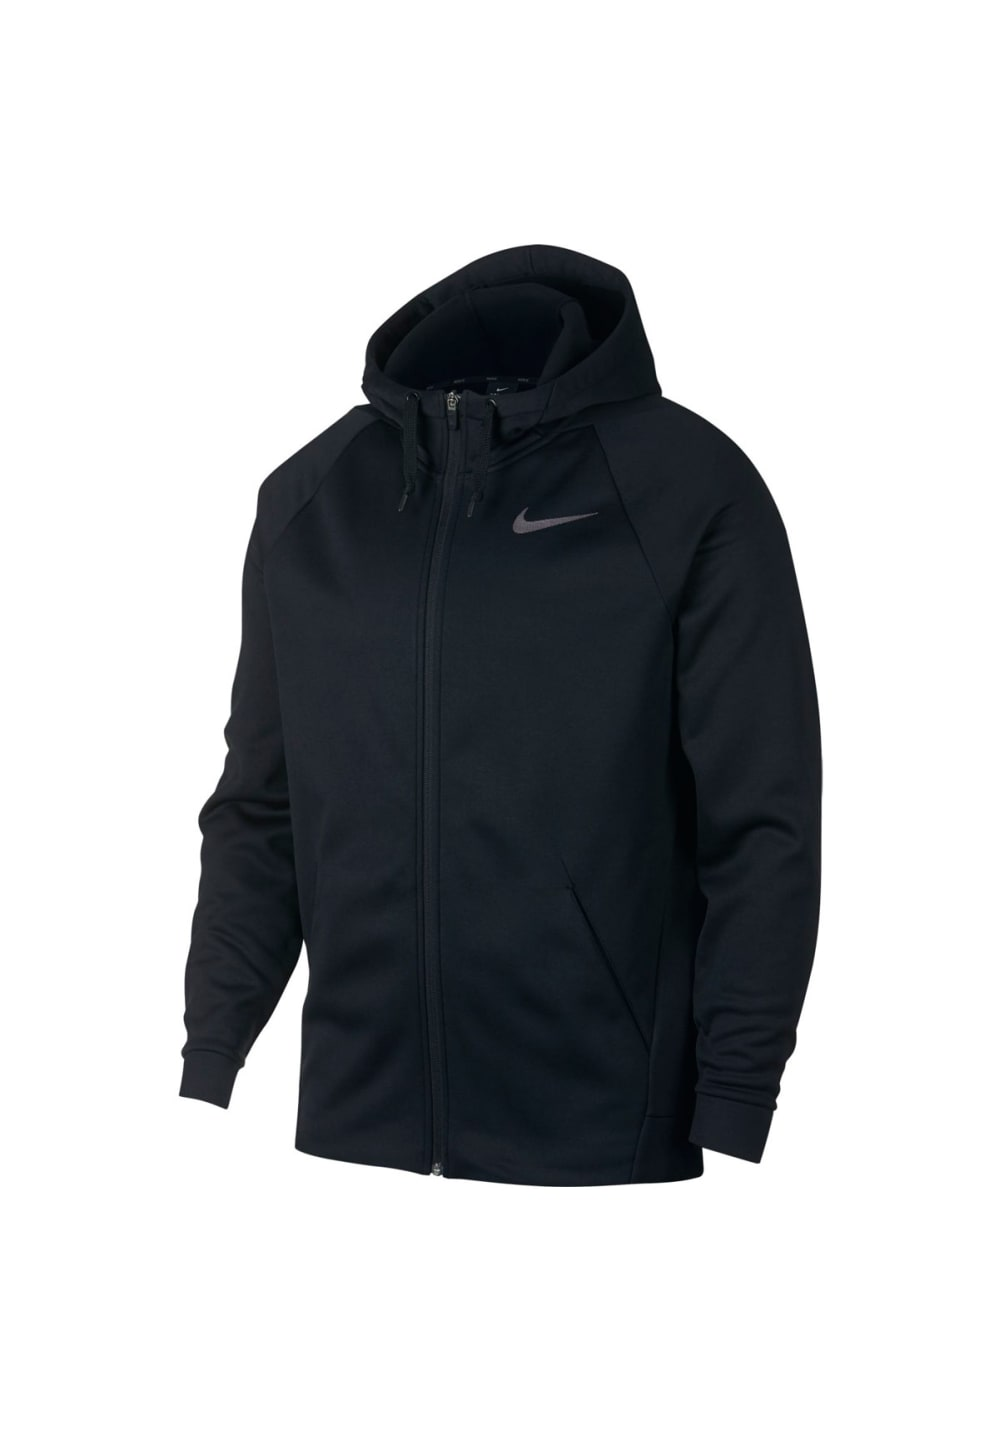 0b8aa7edbf7b Nike trainings hoodie full zip casual clothing for men black run jpg  999x1431 Nike dress clothes